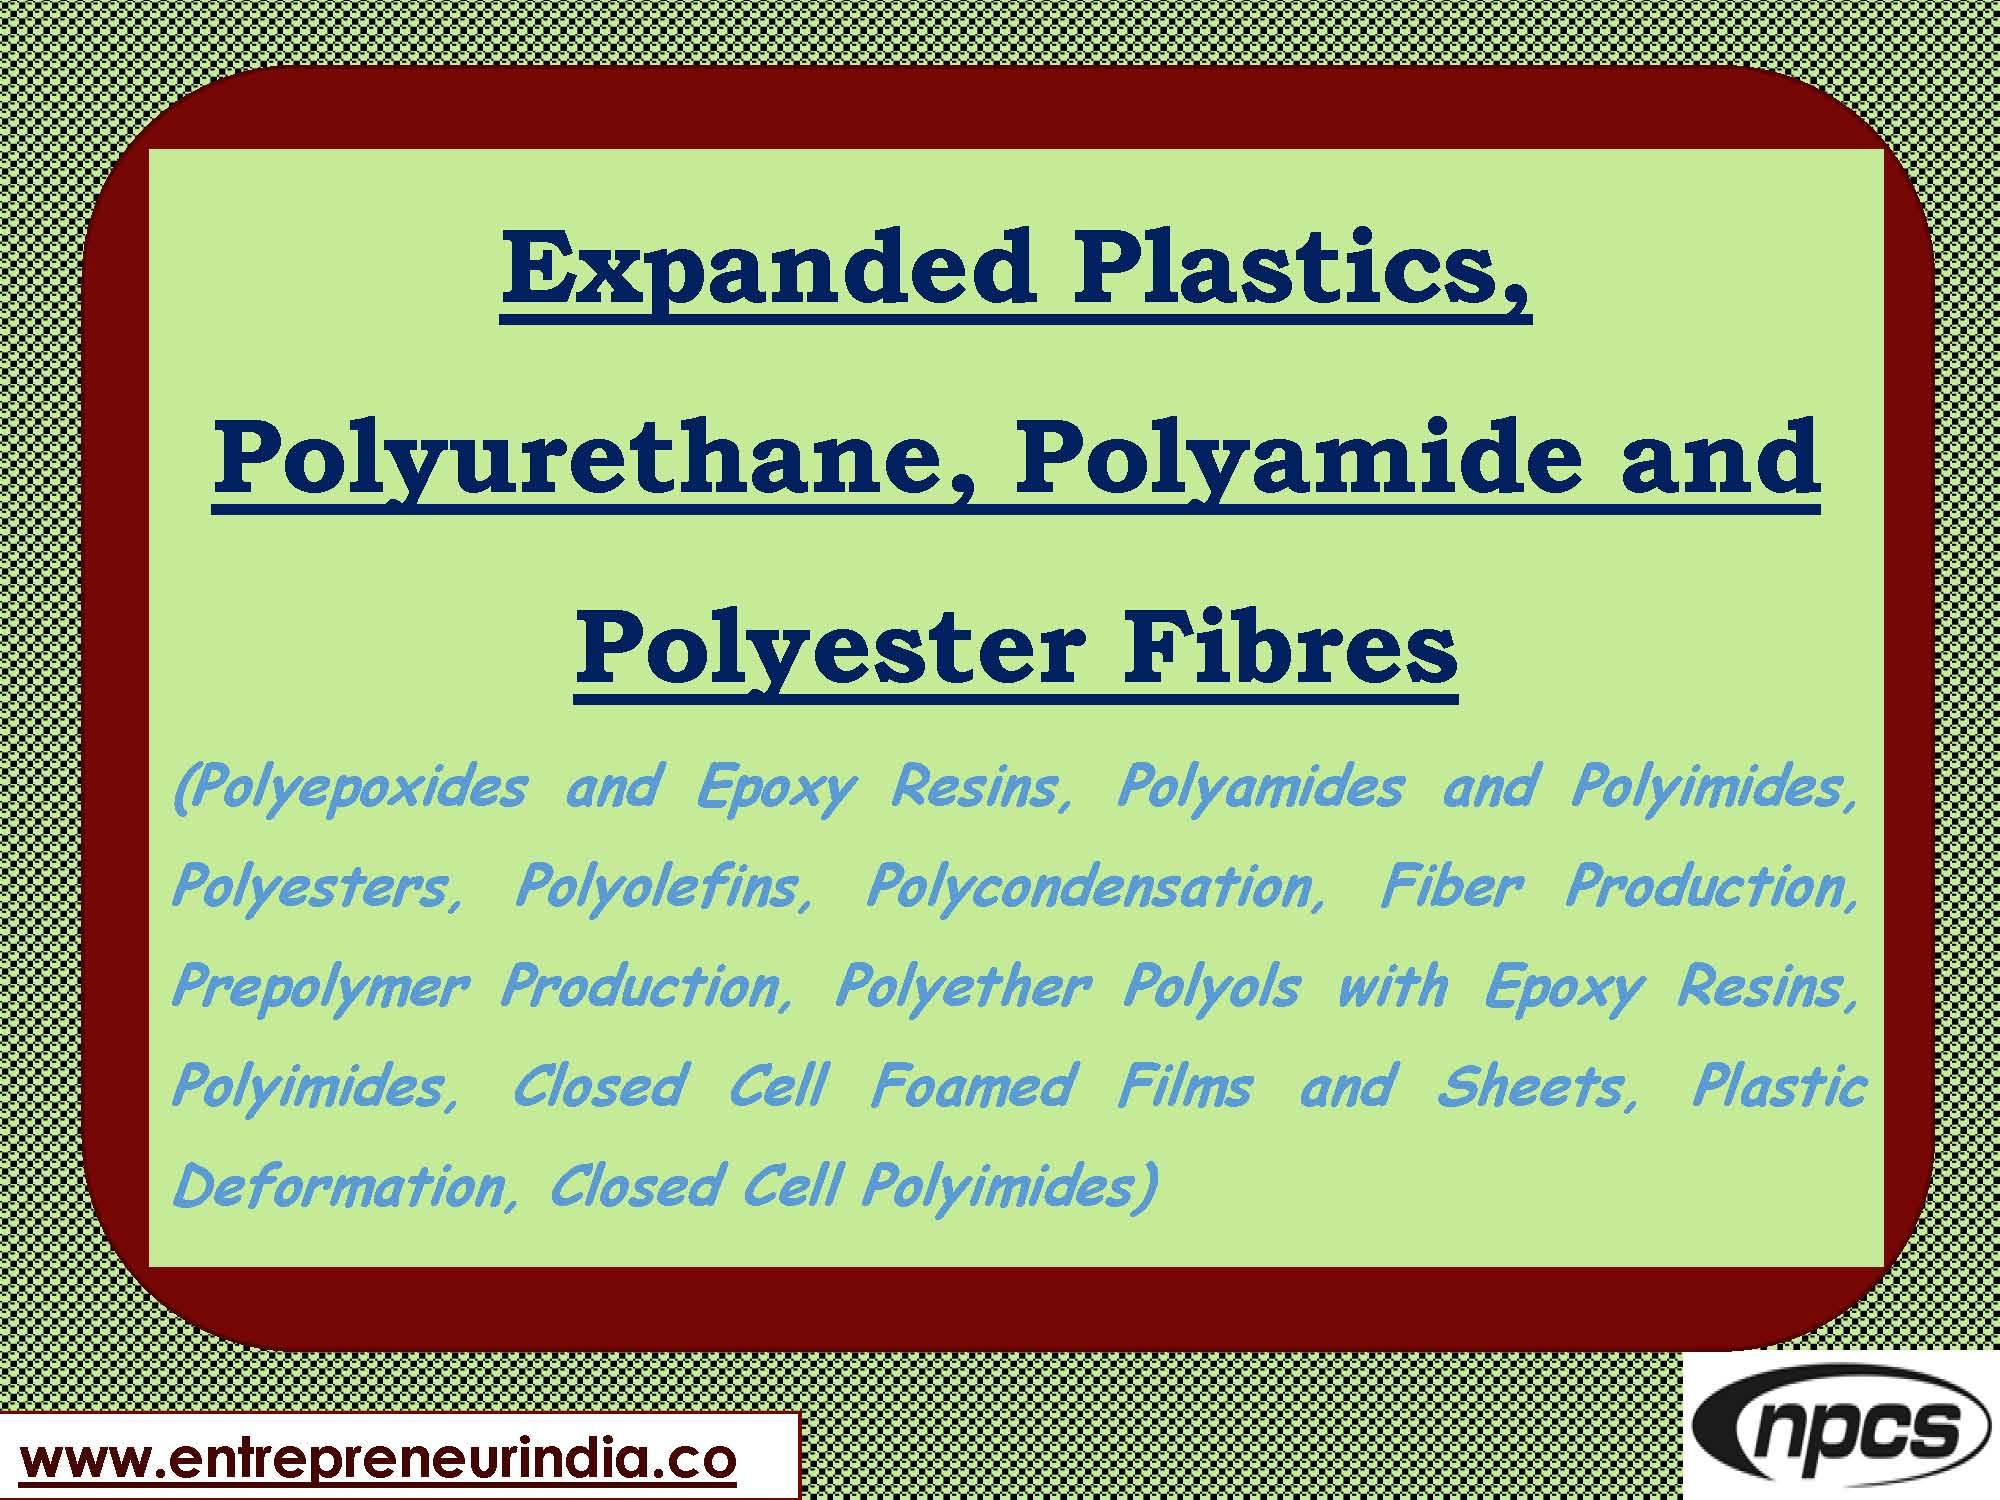 Expanded Plastics Polyurethane Polyamide And Polyester